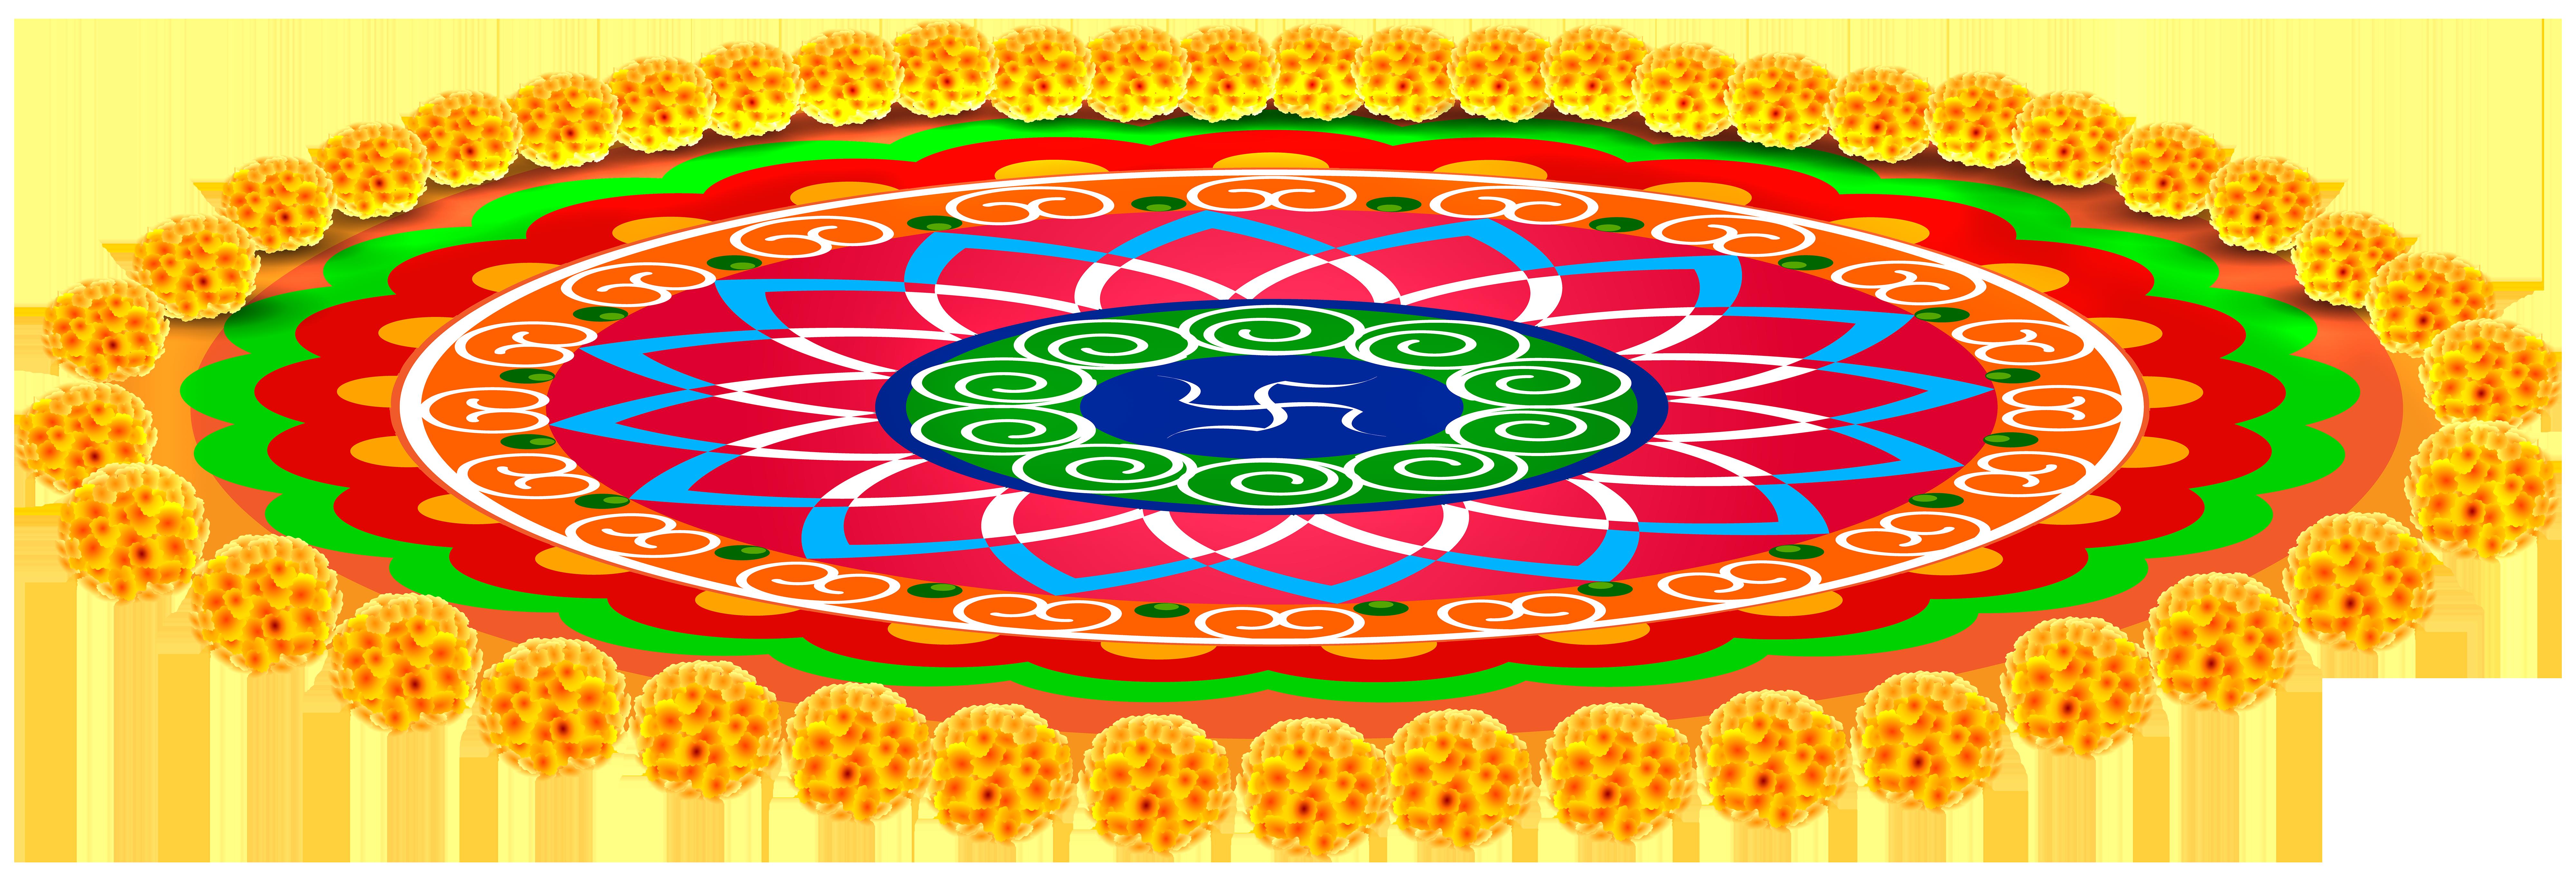 Carpet Clip Art.